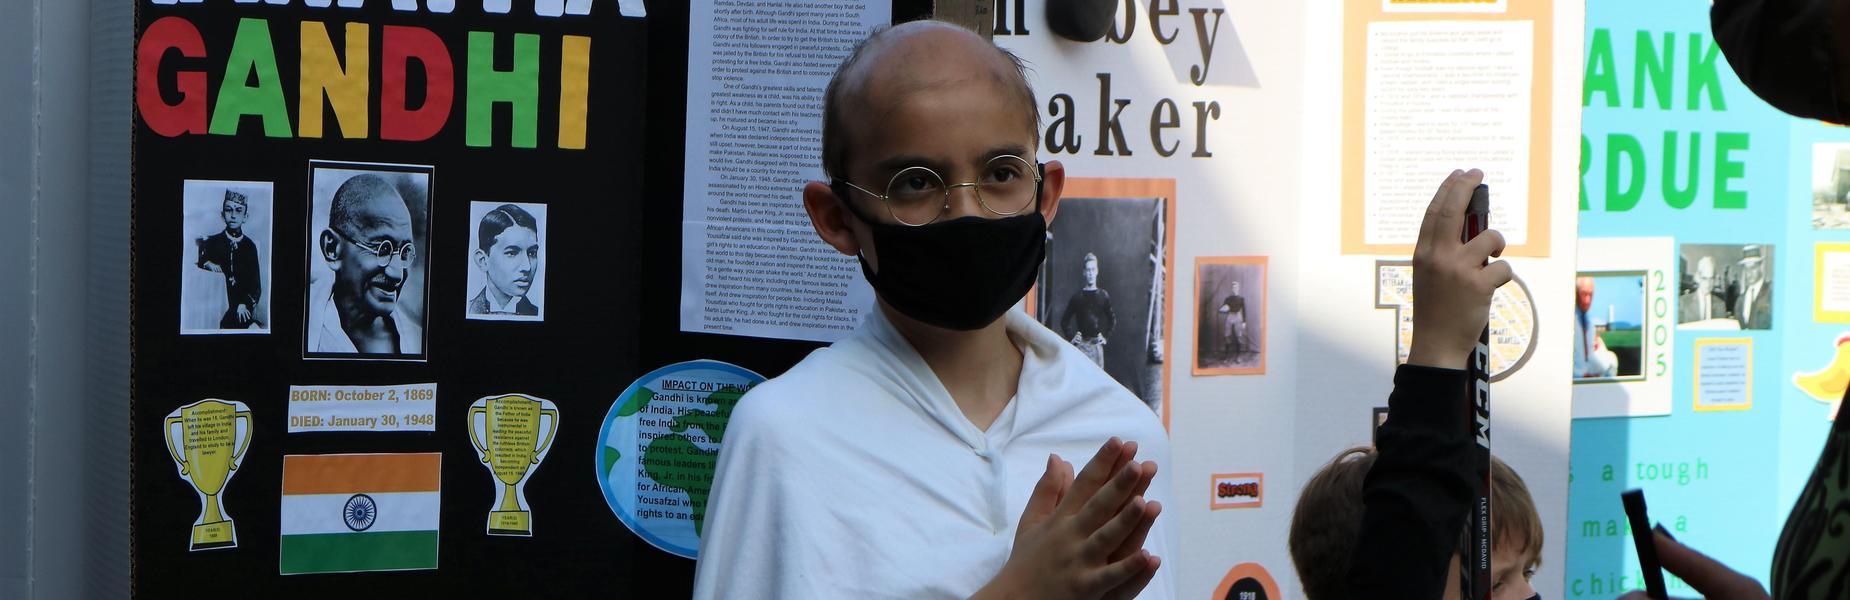 Photo of wilson 5th grader dressed as Gandhi.